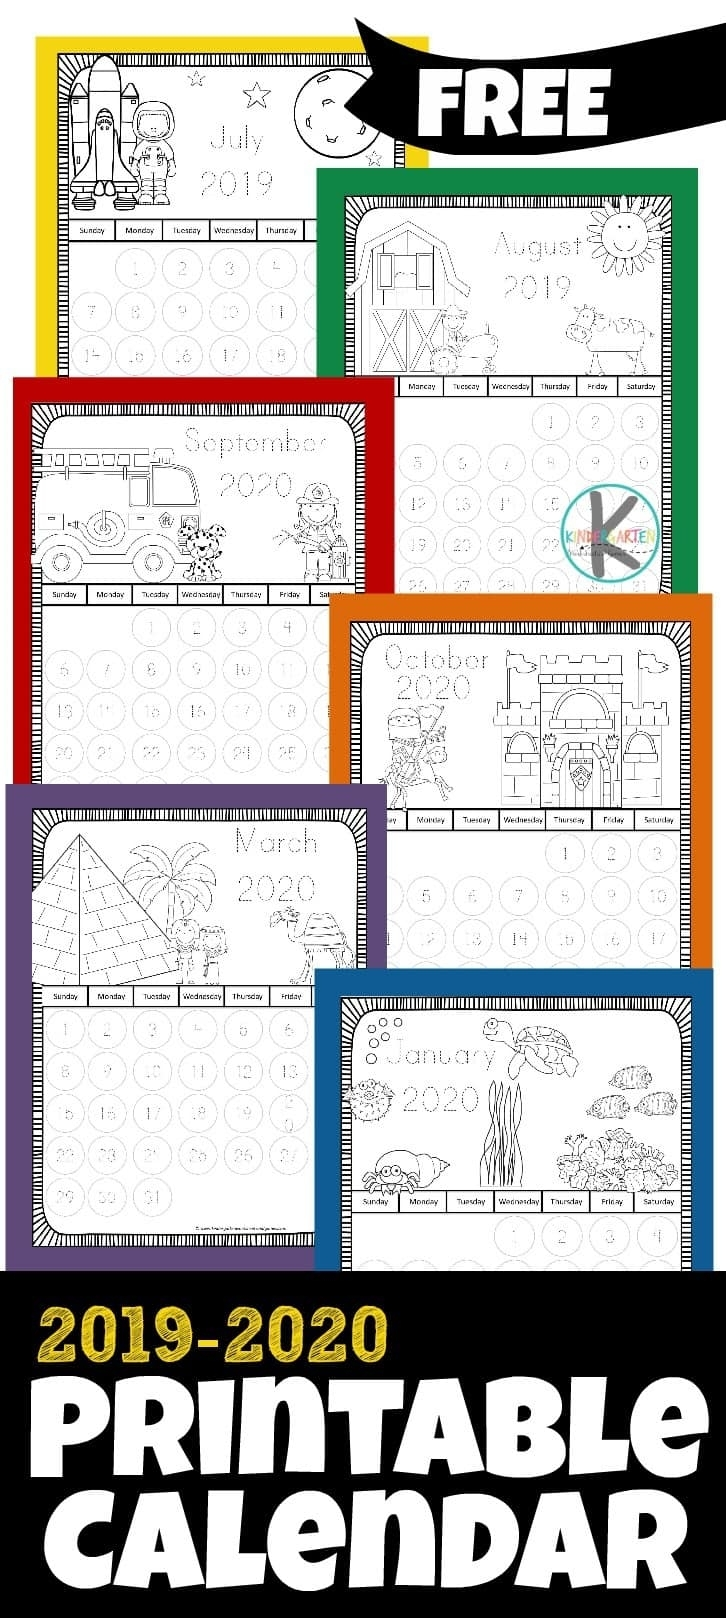 Free 2019-2020 Printable Calendar To Color with regard to Free Printable Coloring Calendar 2020